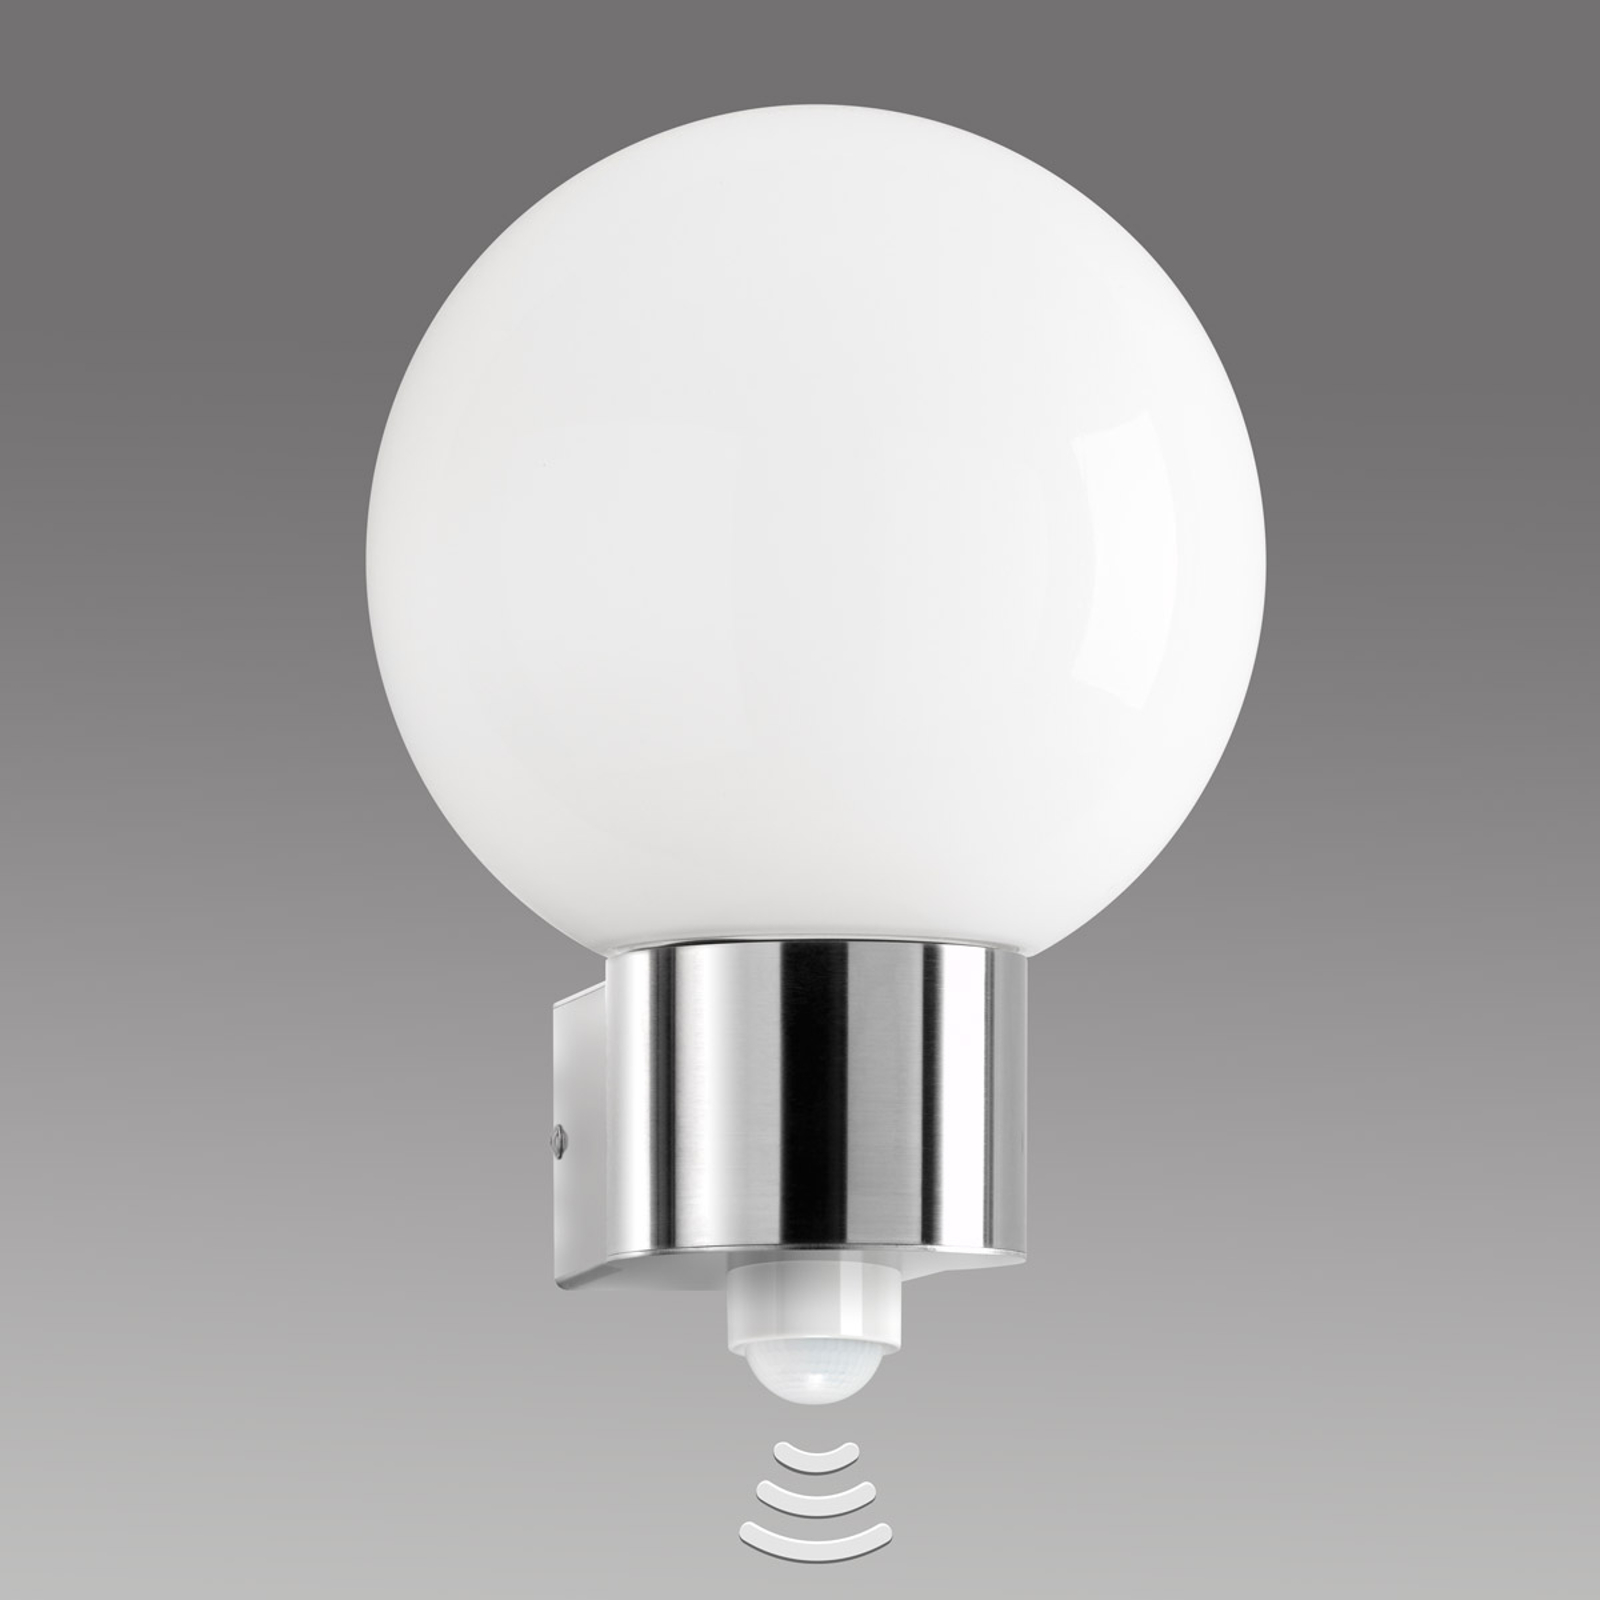 Edelstahl-Außenwandleuchte Kekoa mit Sensor